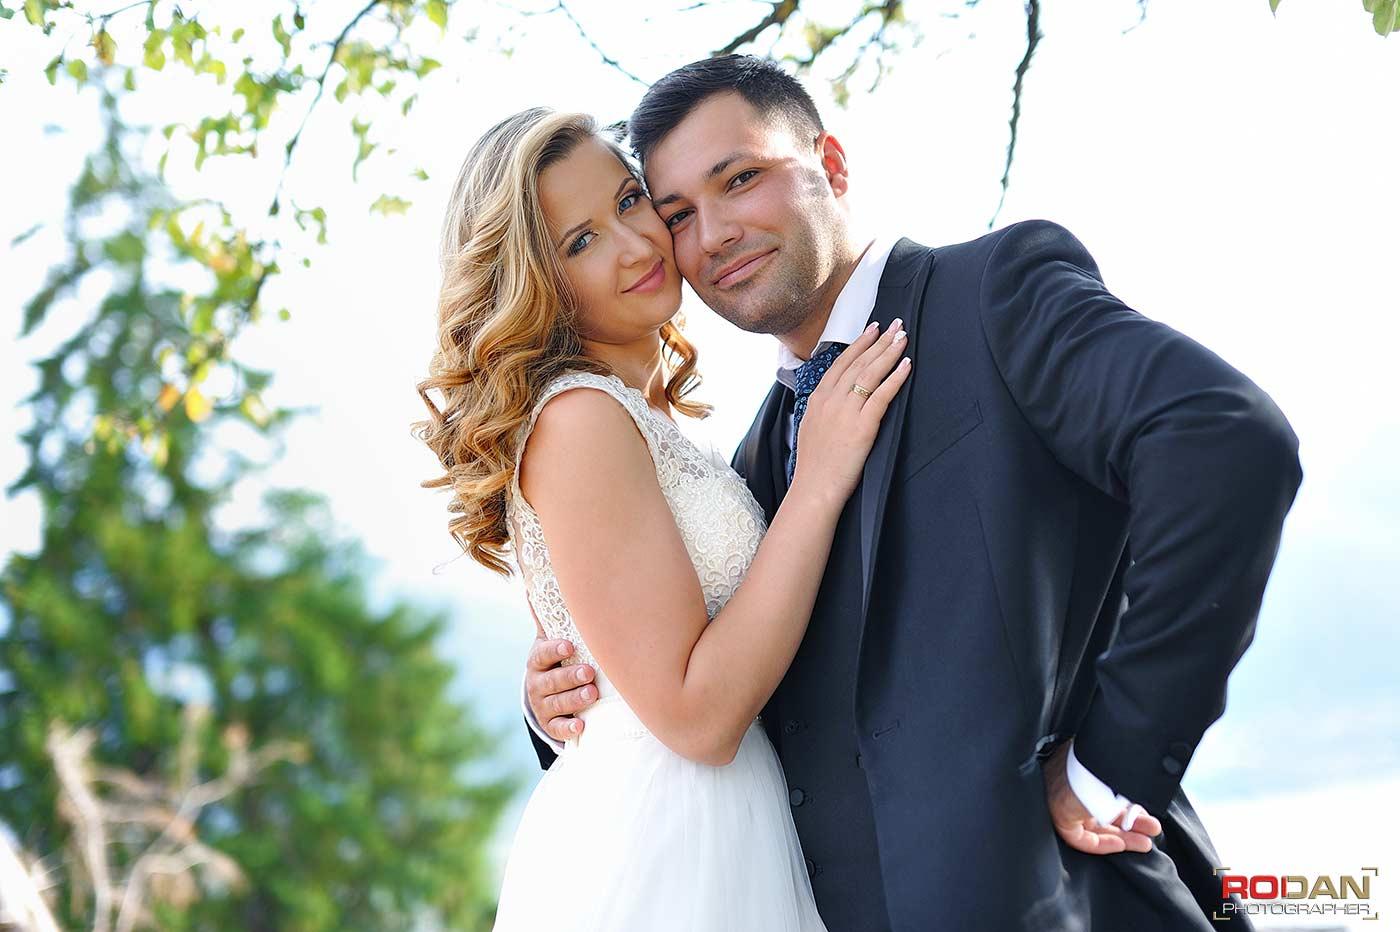 Fotograf pentru nunta Piatra Neamt - Rodan Photography